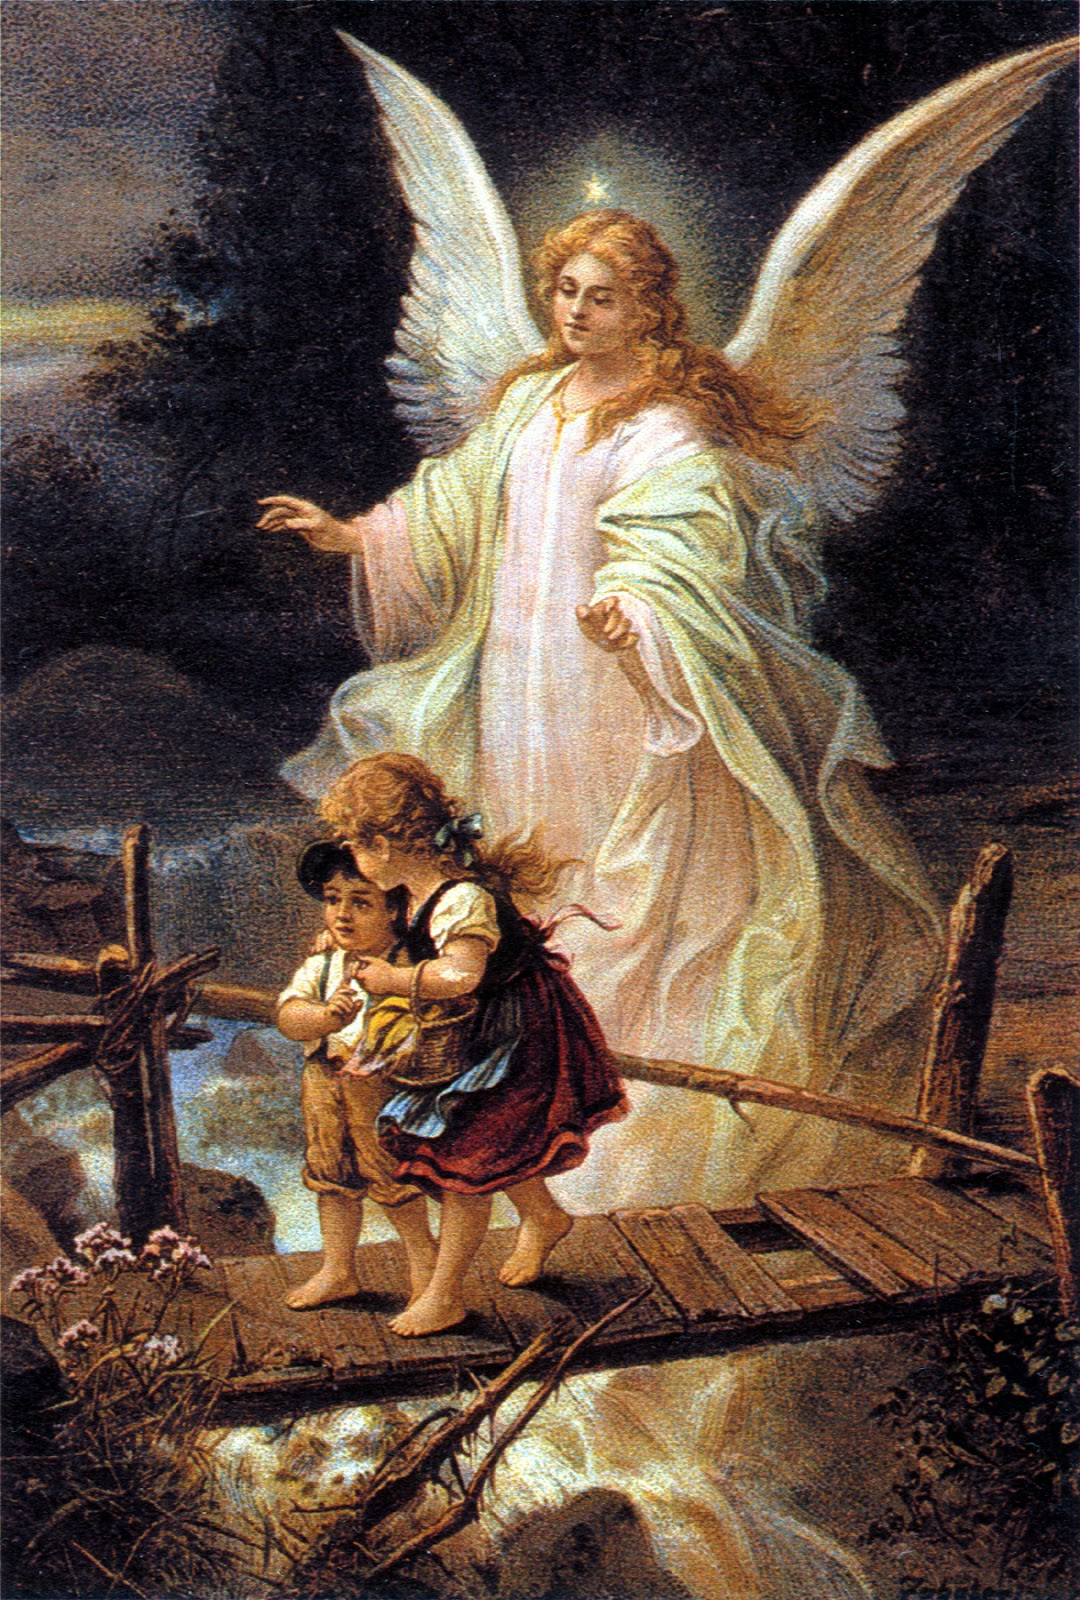 Angel Angelic Cherubim German postcard 1900 similar to works by Bernhard Plockhorst (1825–1907) Guardian Guardian Angel Heaven Heavenly Psychopomp ...